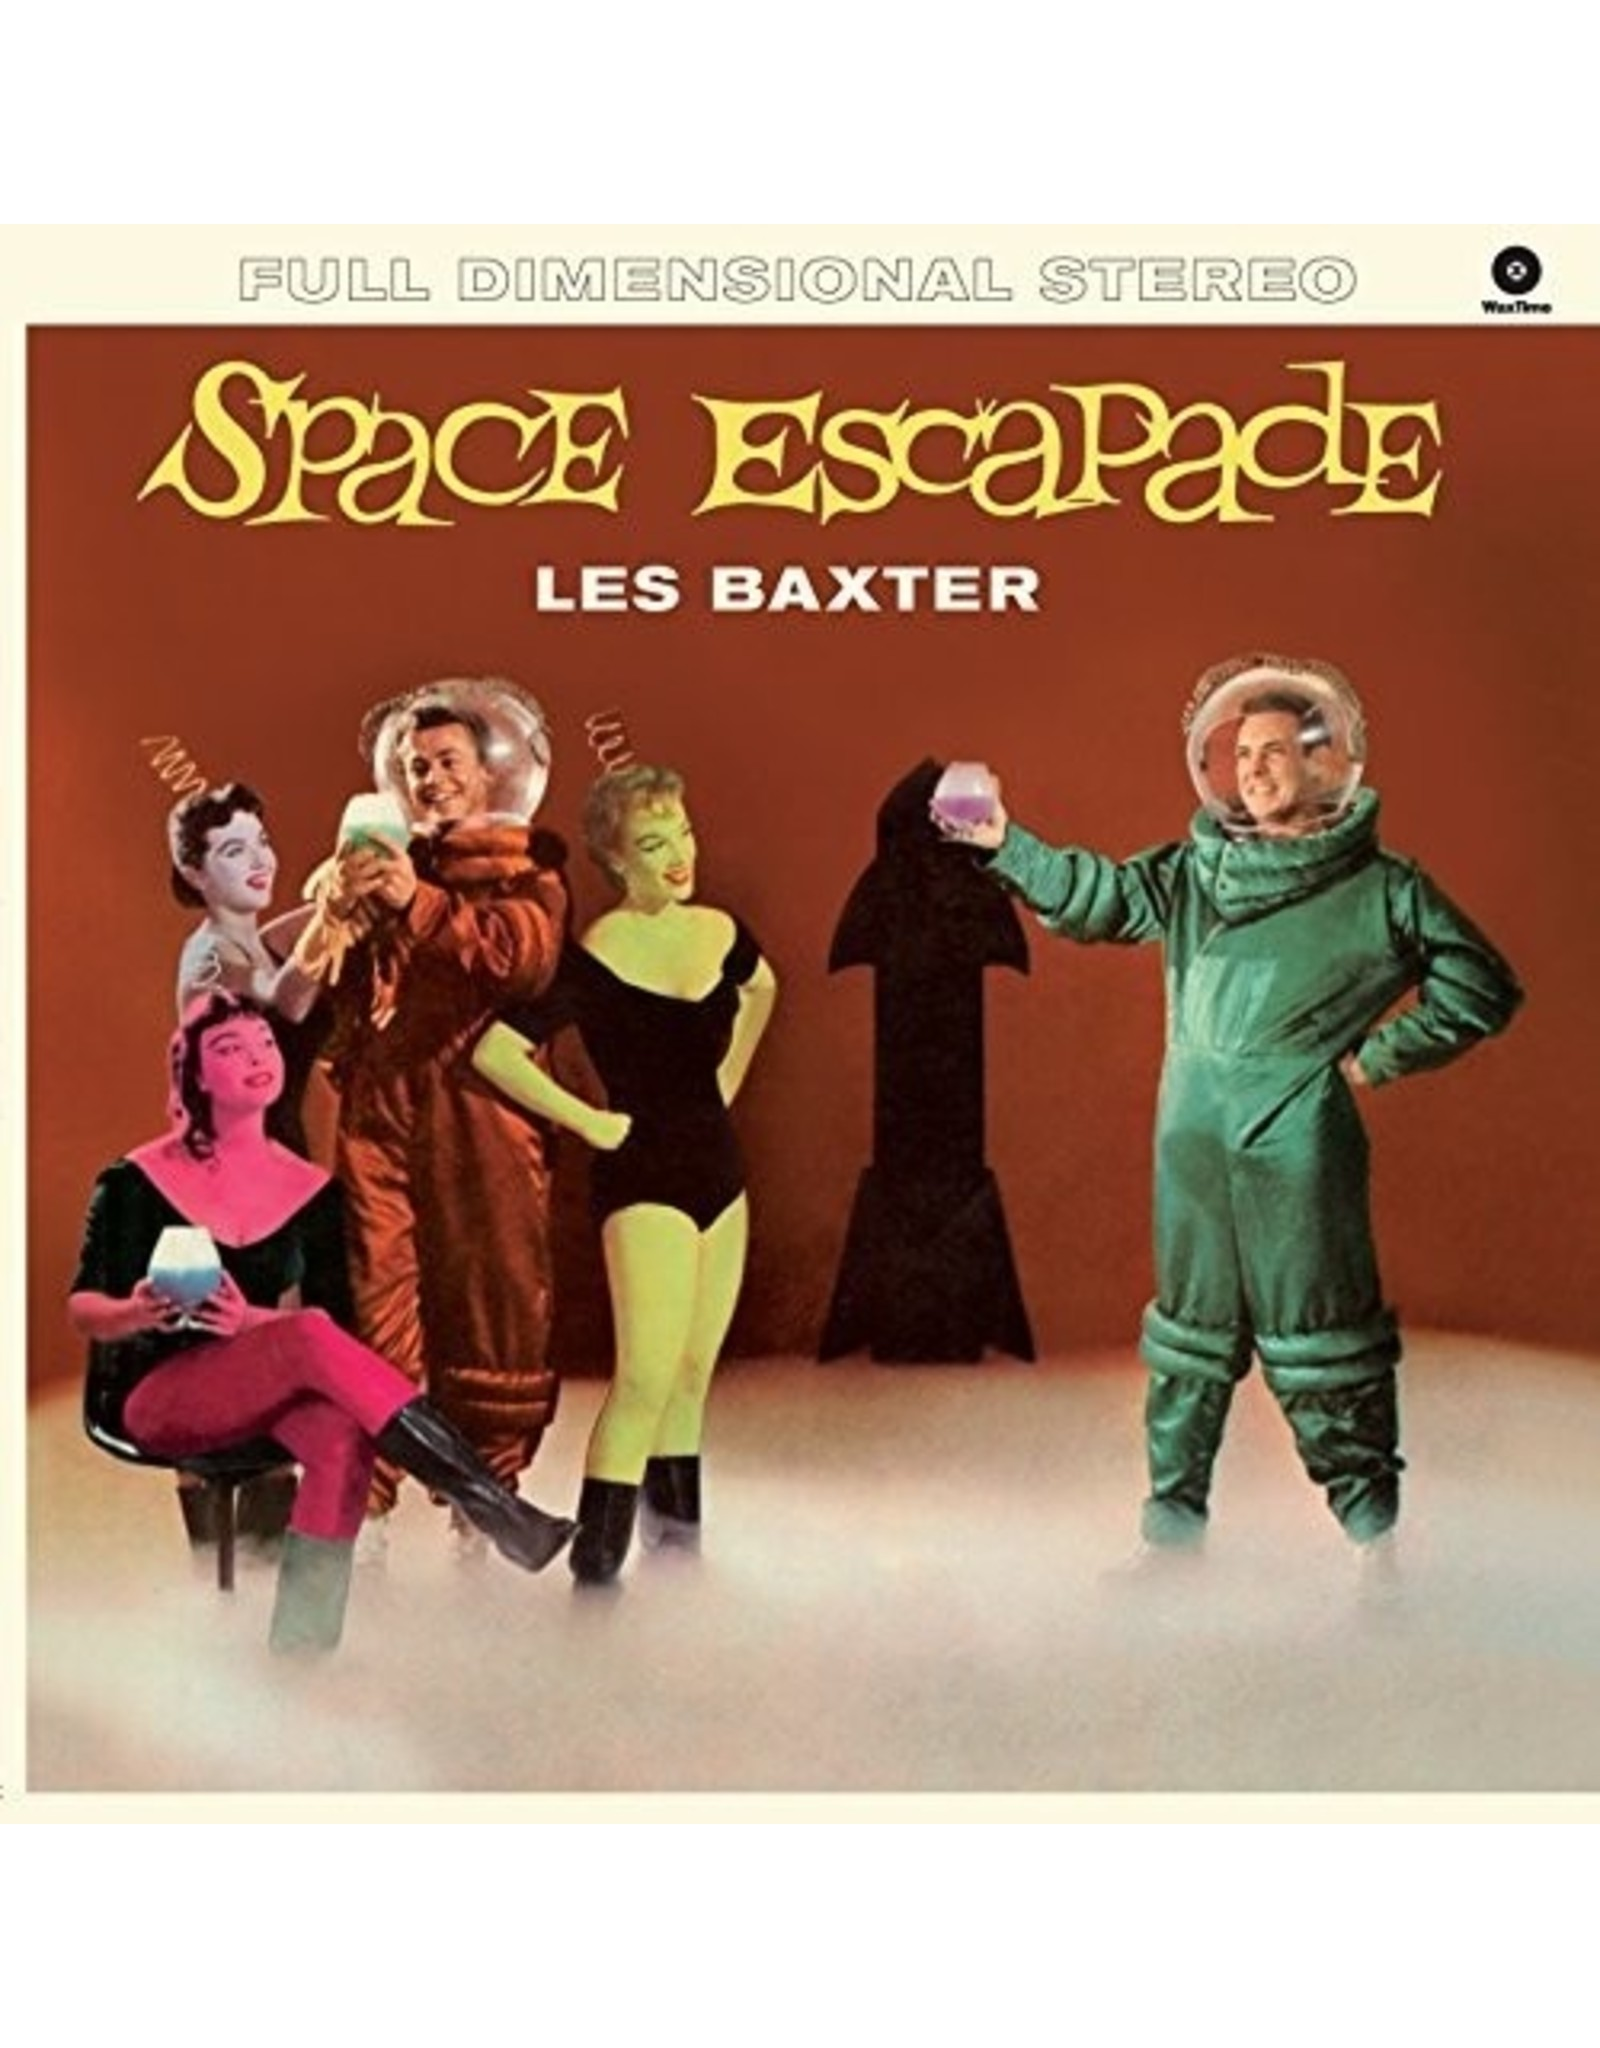 New Vinyl Les Baxter - Space Escapade LP